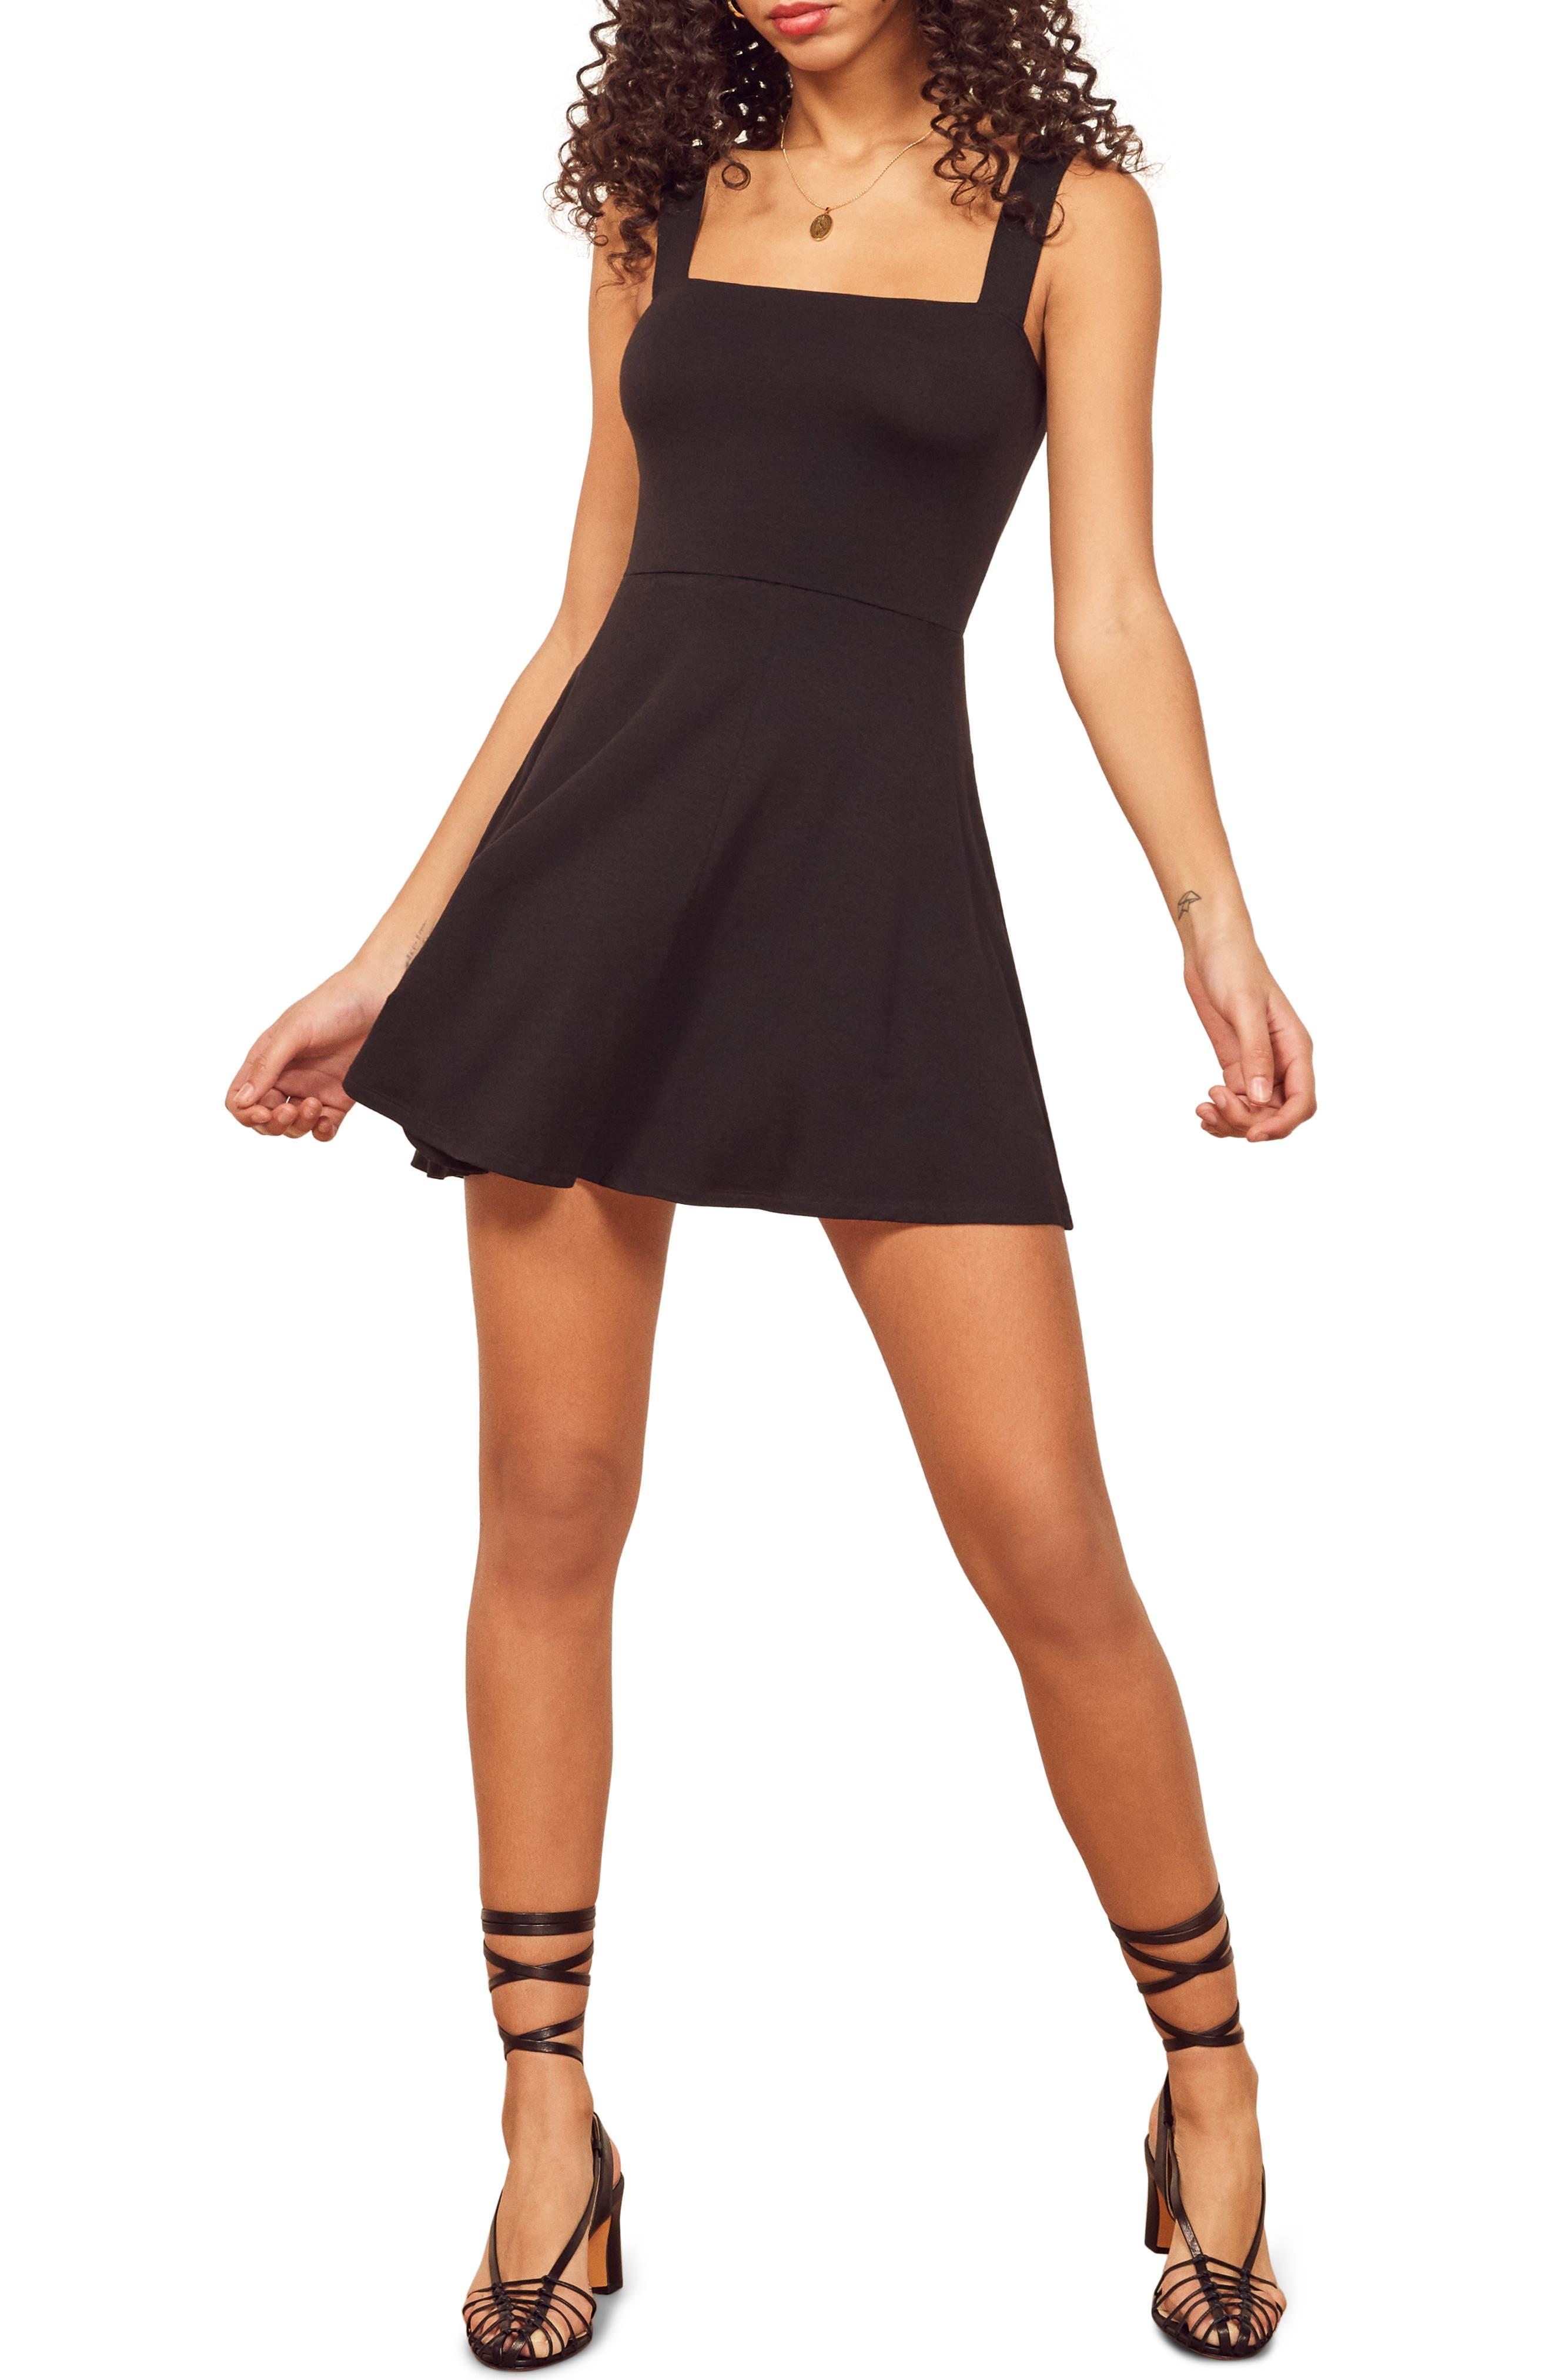 Reformation Anicka Square Neck Skater Dress, Black